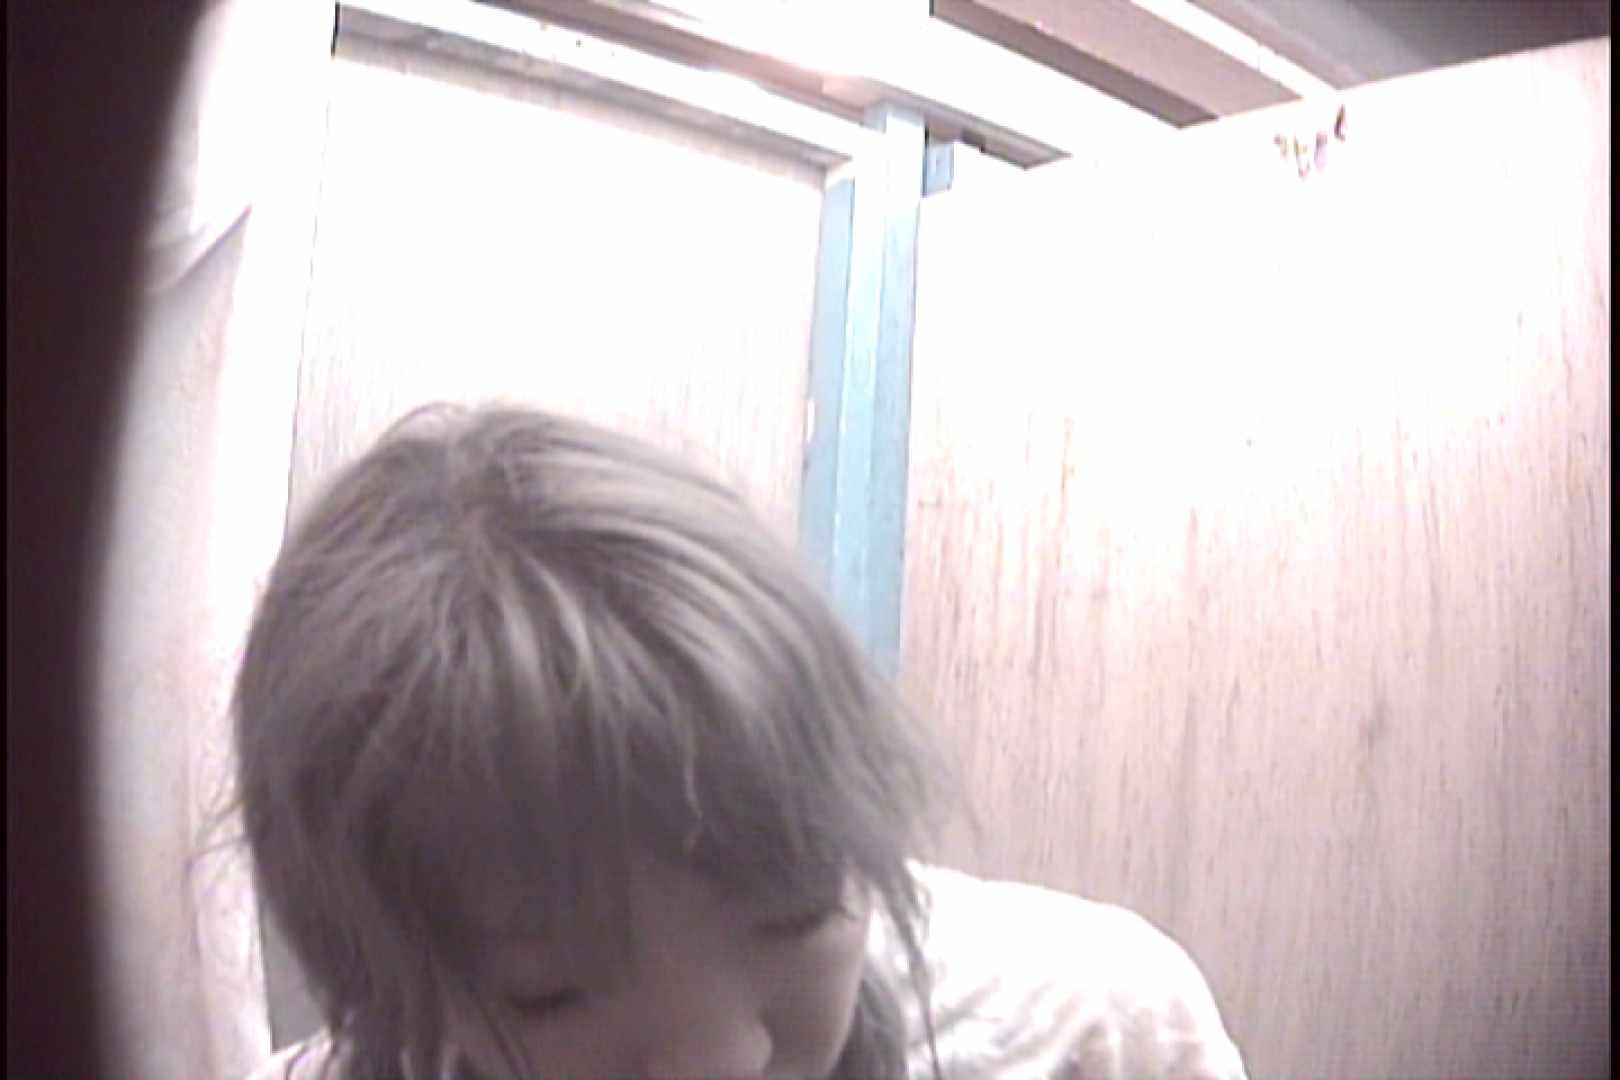 File.37 収穫の秋、こんなの取れました。必見です!【2011年20位】 おしり セックス無修正動画無料 97画像 20